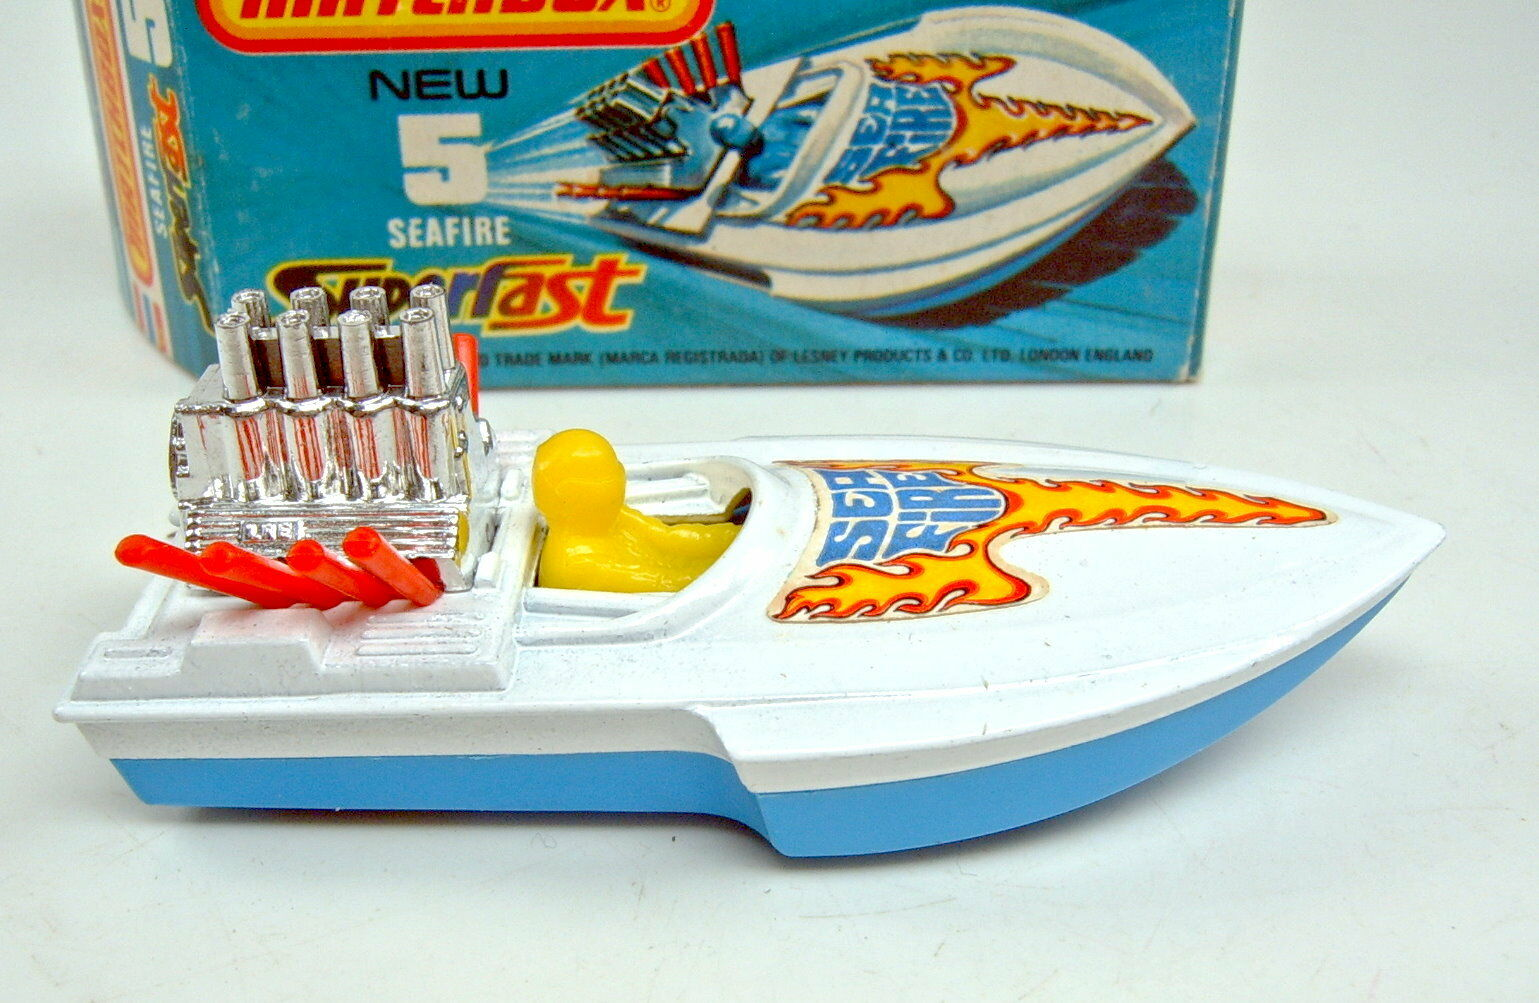 Matchbox SF SF SF no 05b Seafire boat azul & blancoo zitronenamarilloer conductor top en Box f526c1